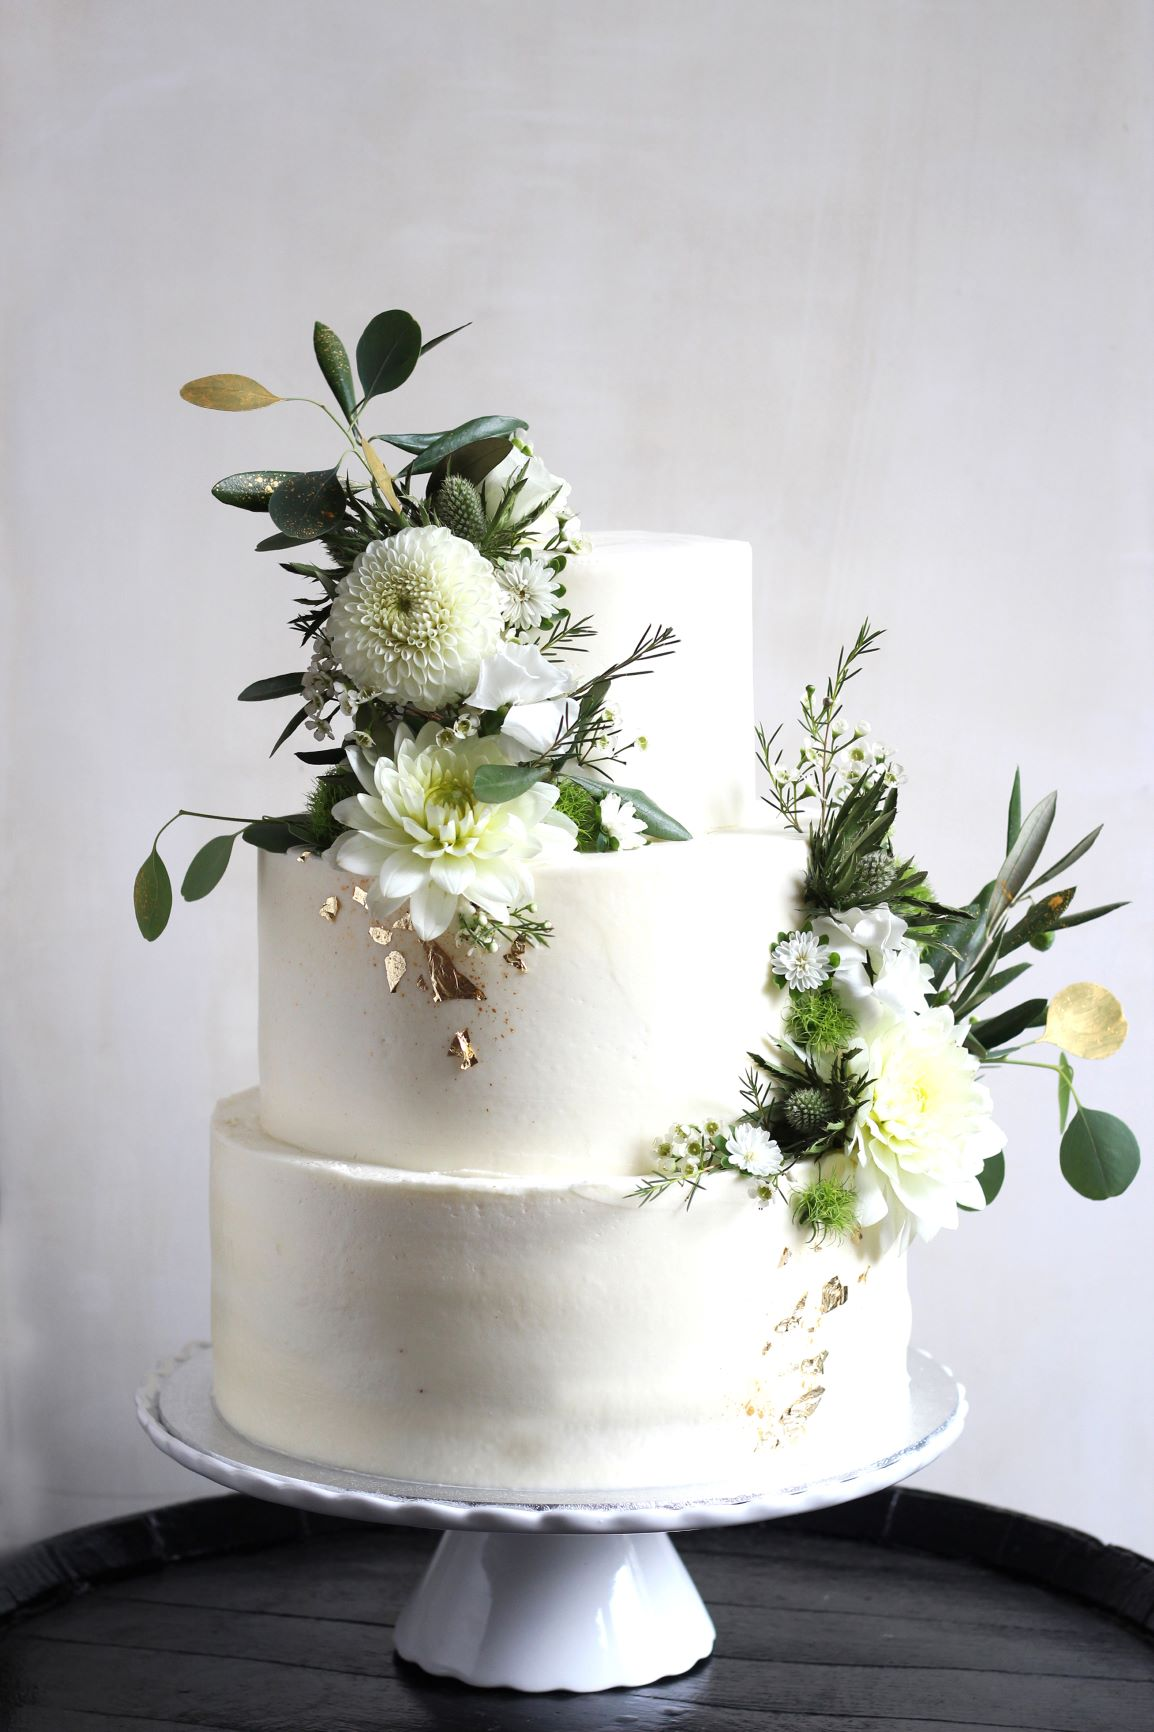 Shirley & Martan´s wedding cake